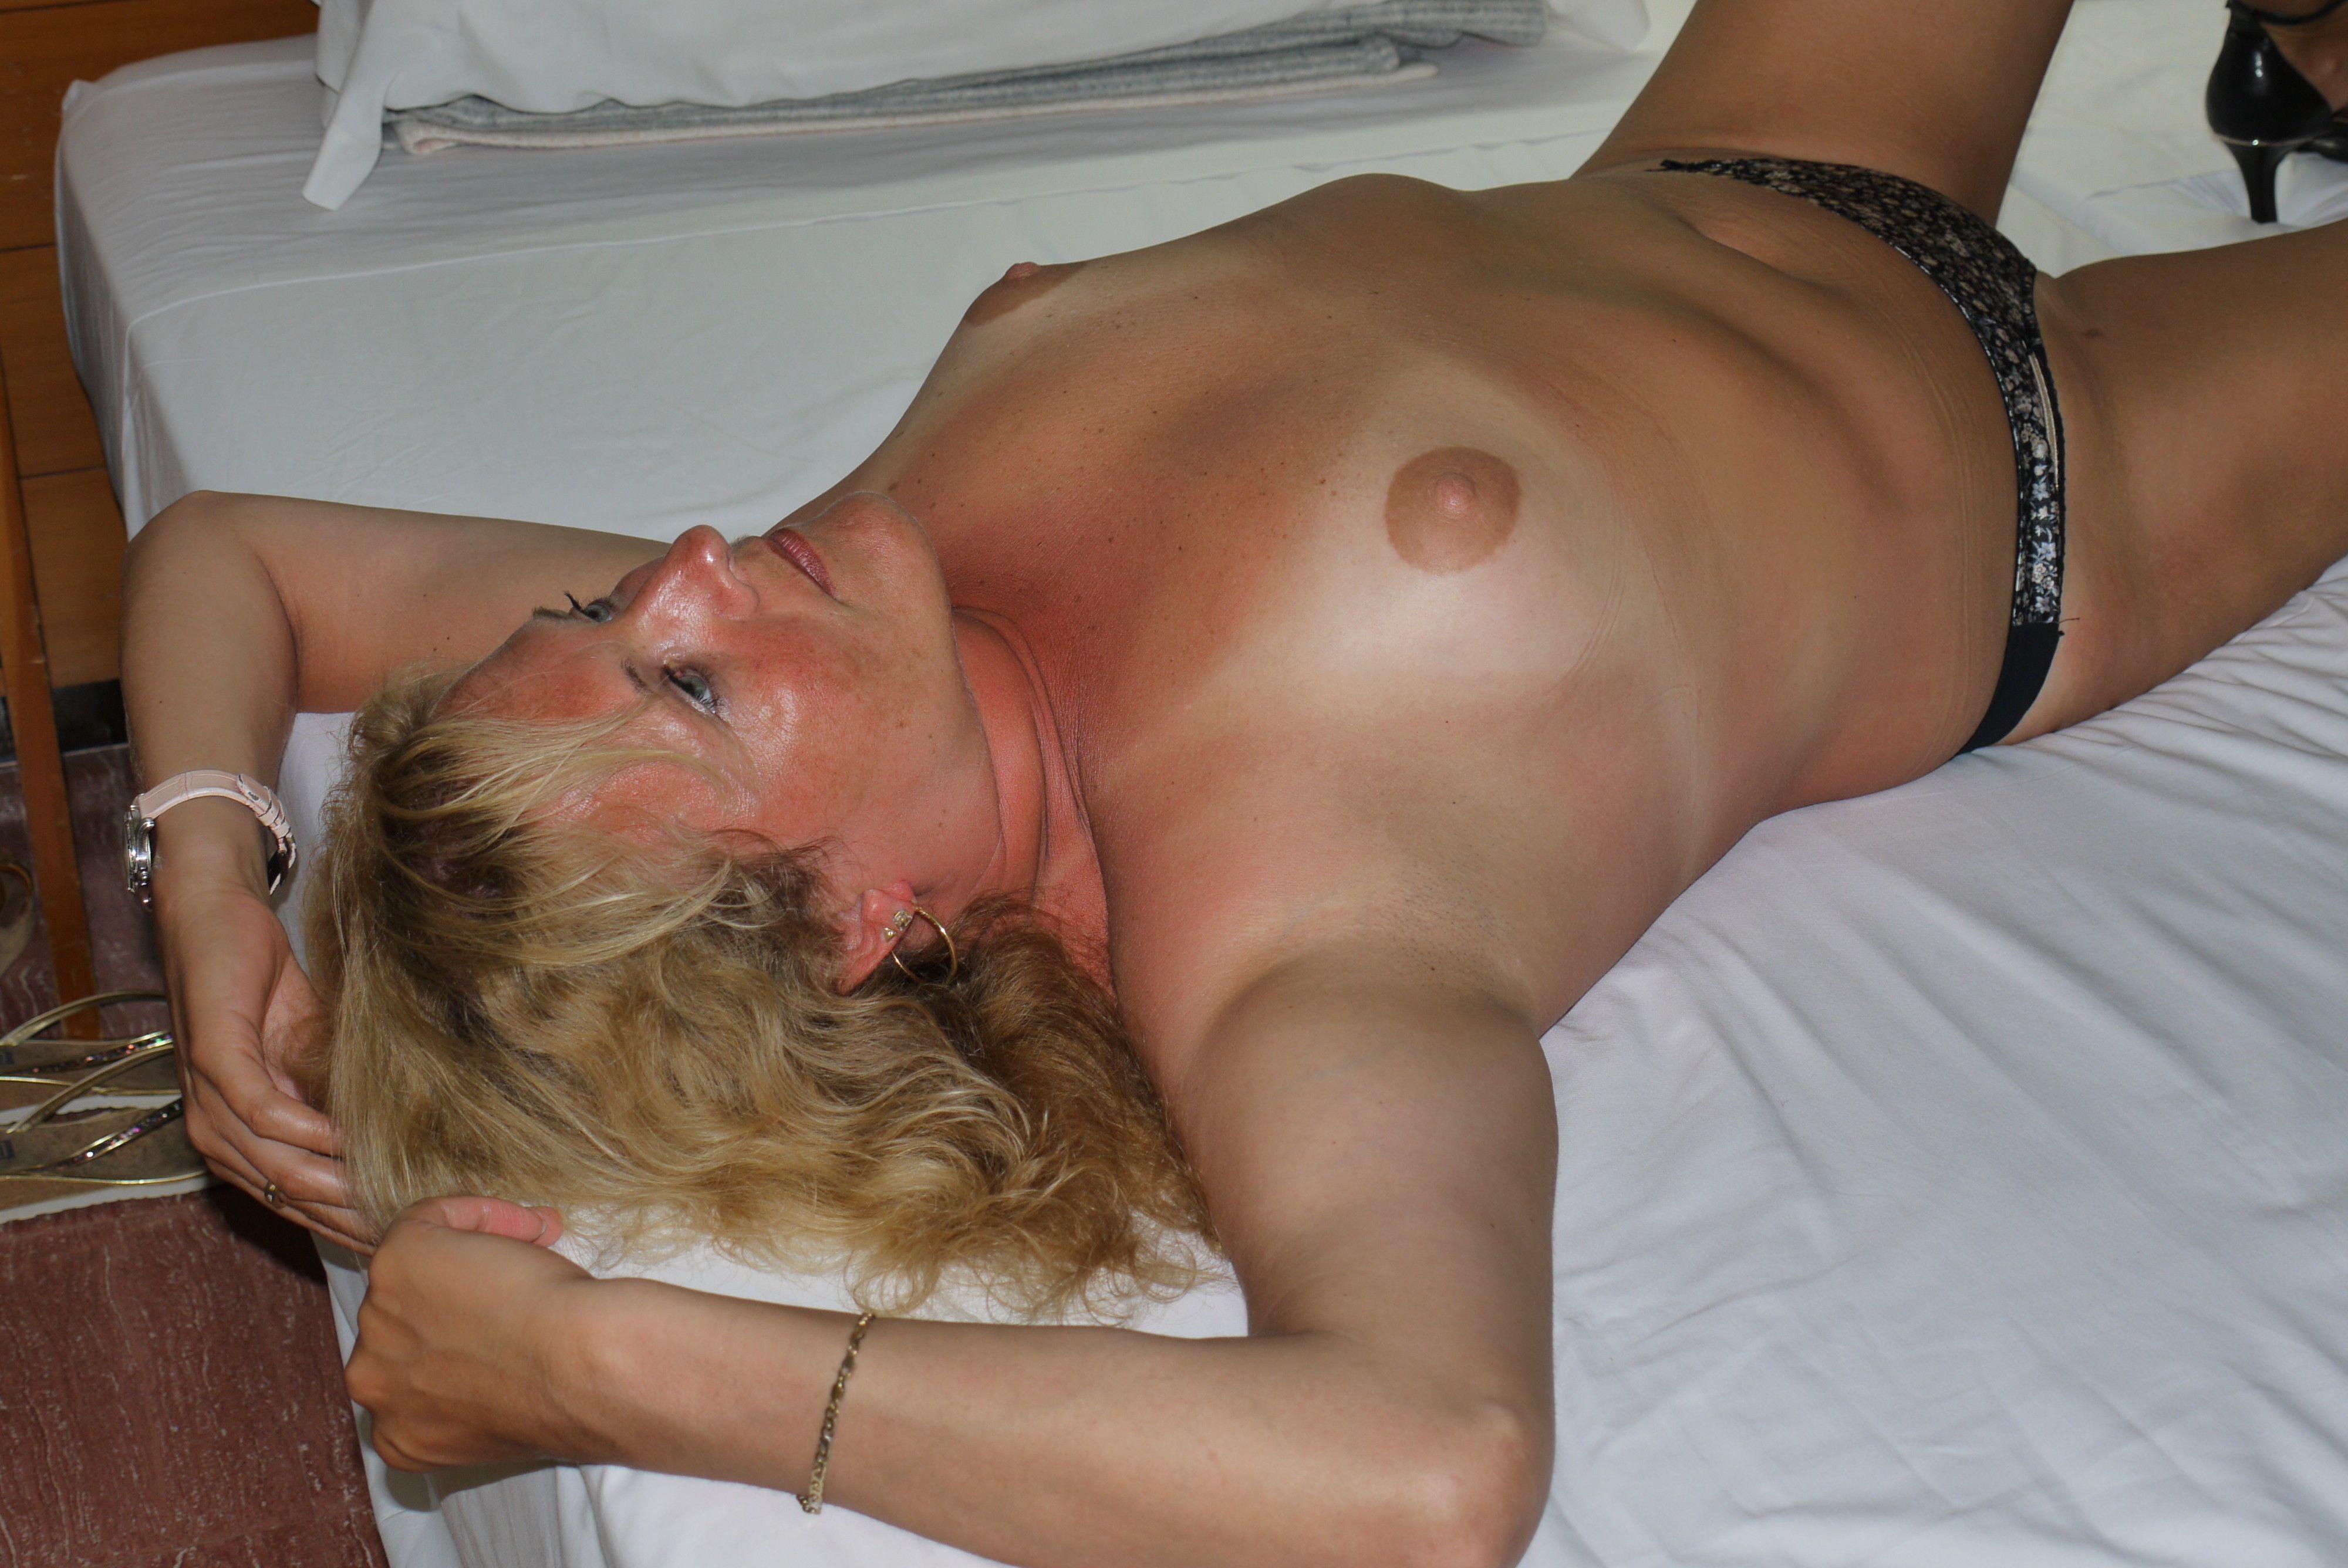 black women boobs naked sex